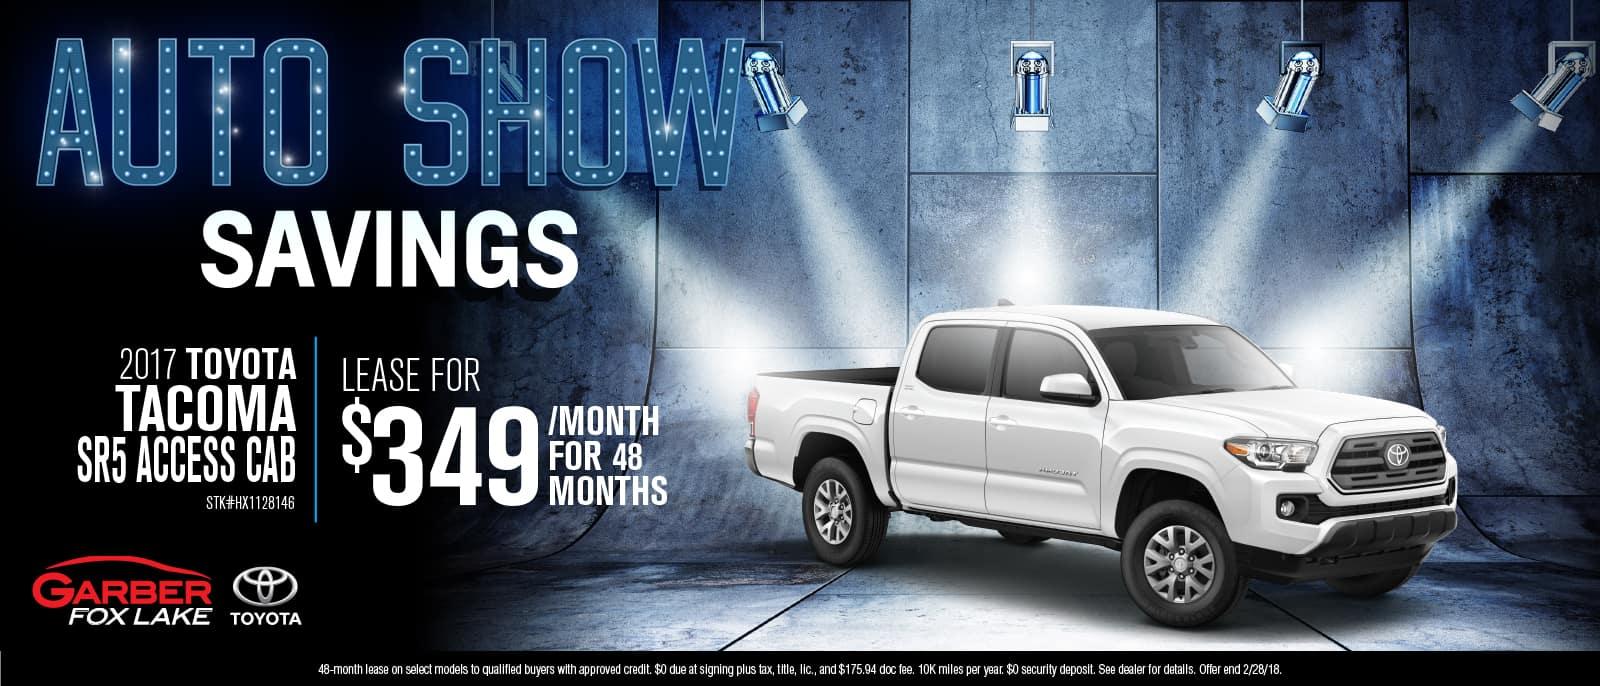 Toyota Tacoma Auto Show Savings